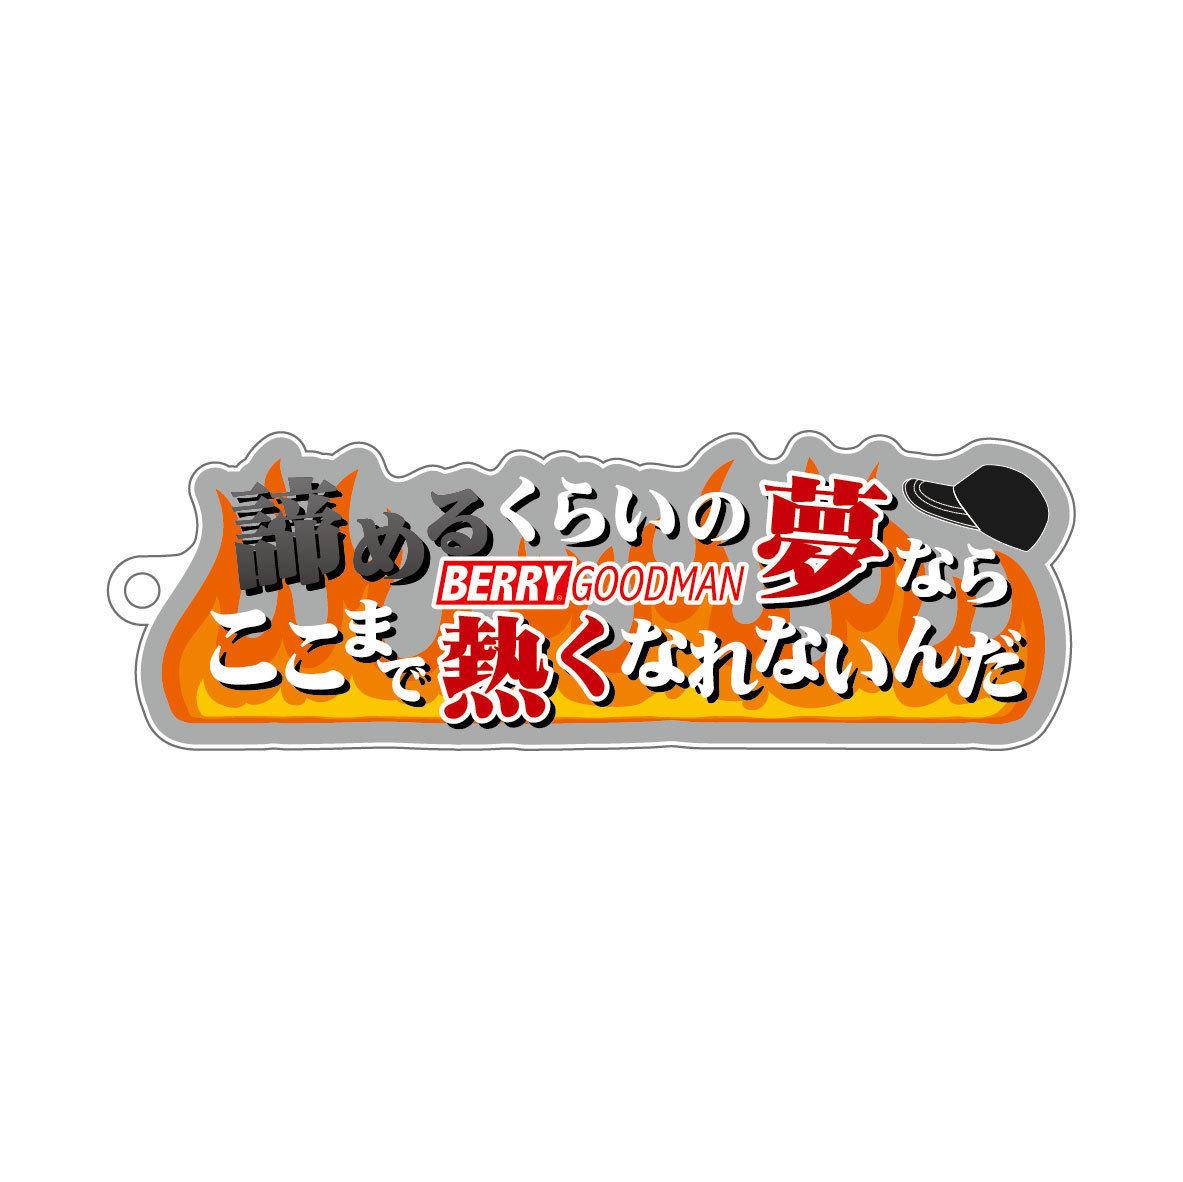 TEPPAN歌詞キーホルダー (ランダム7種類)